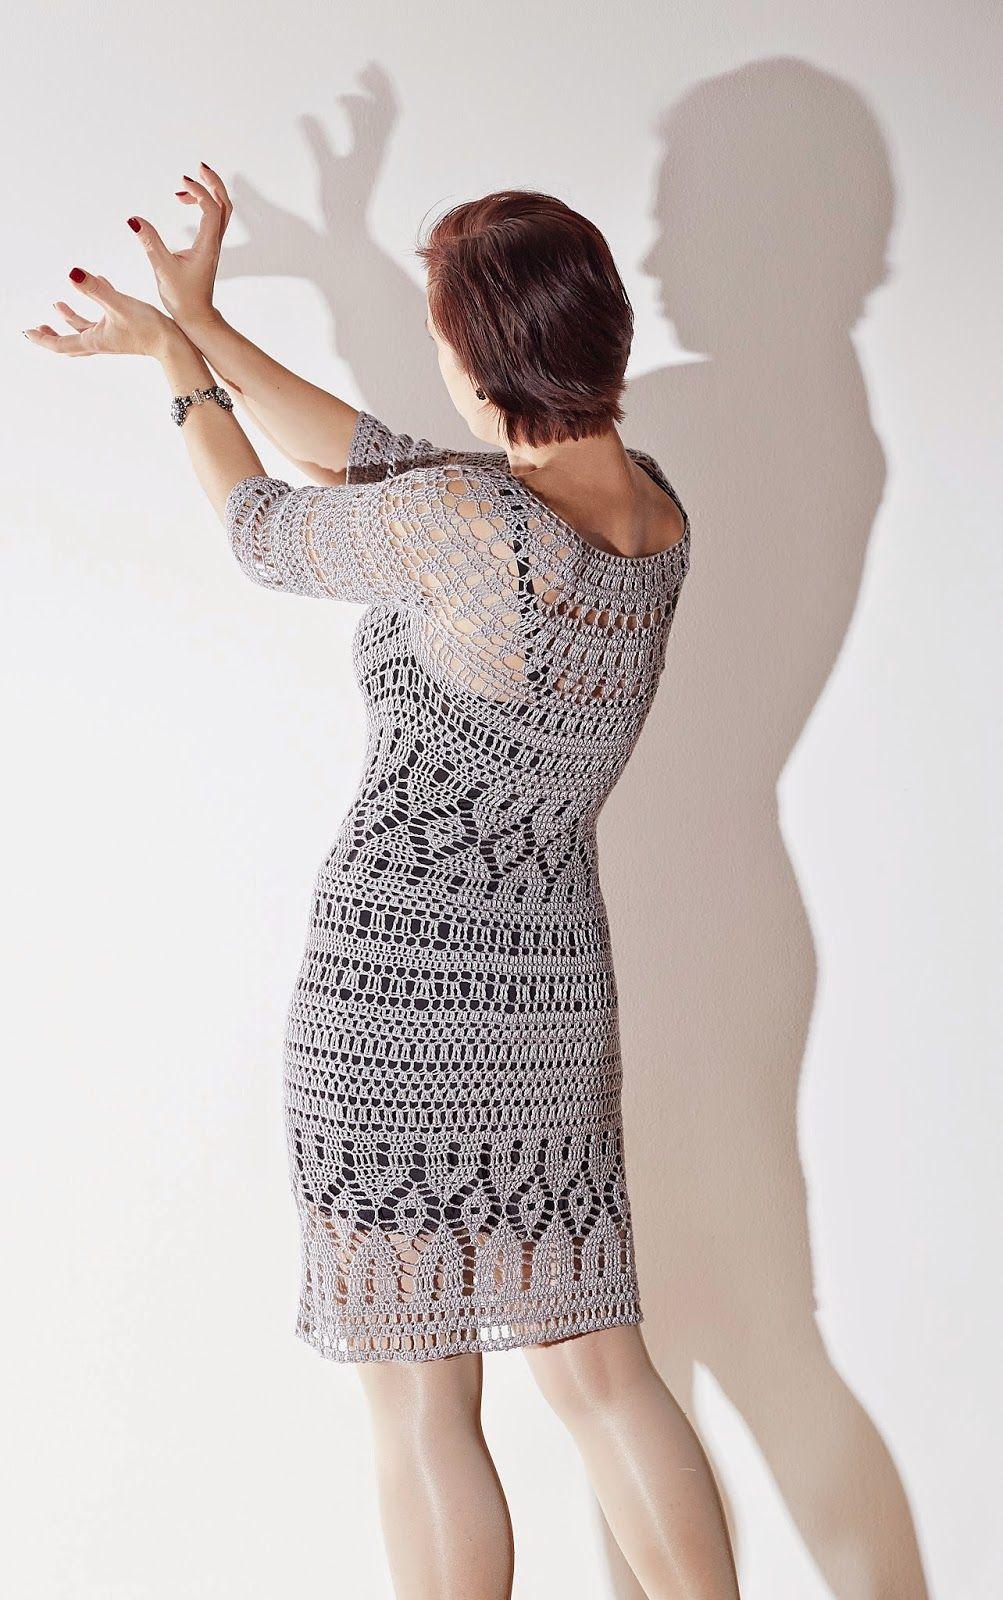 Bamboo crochet dress Vivrut Designs